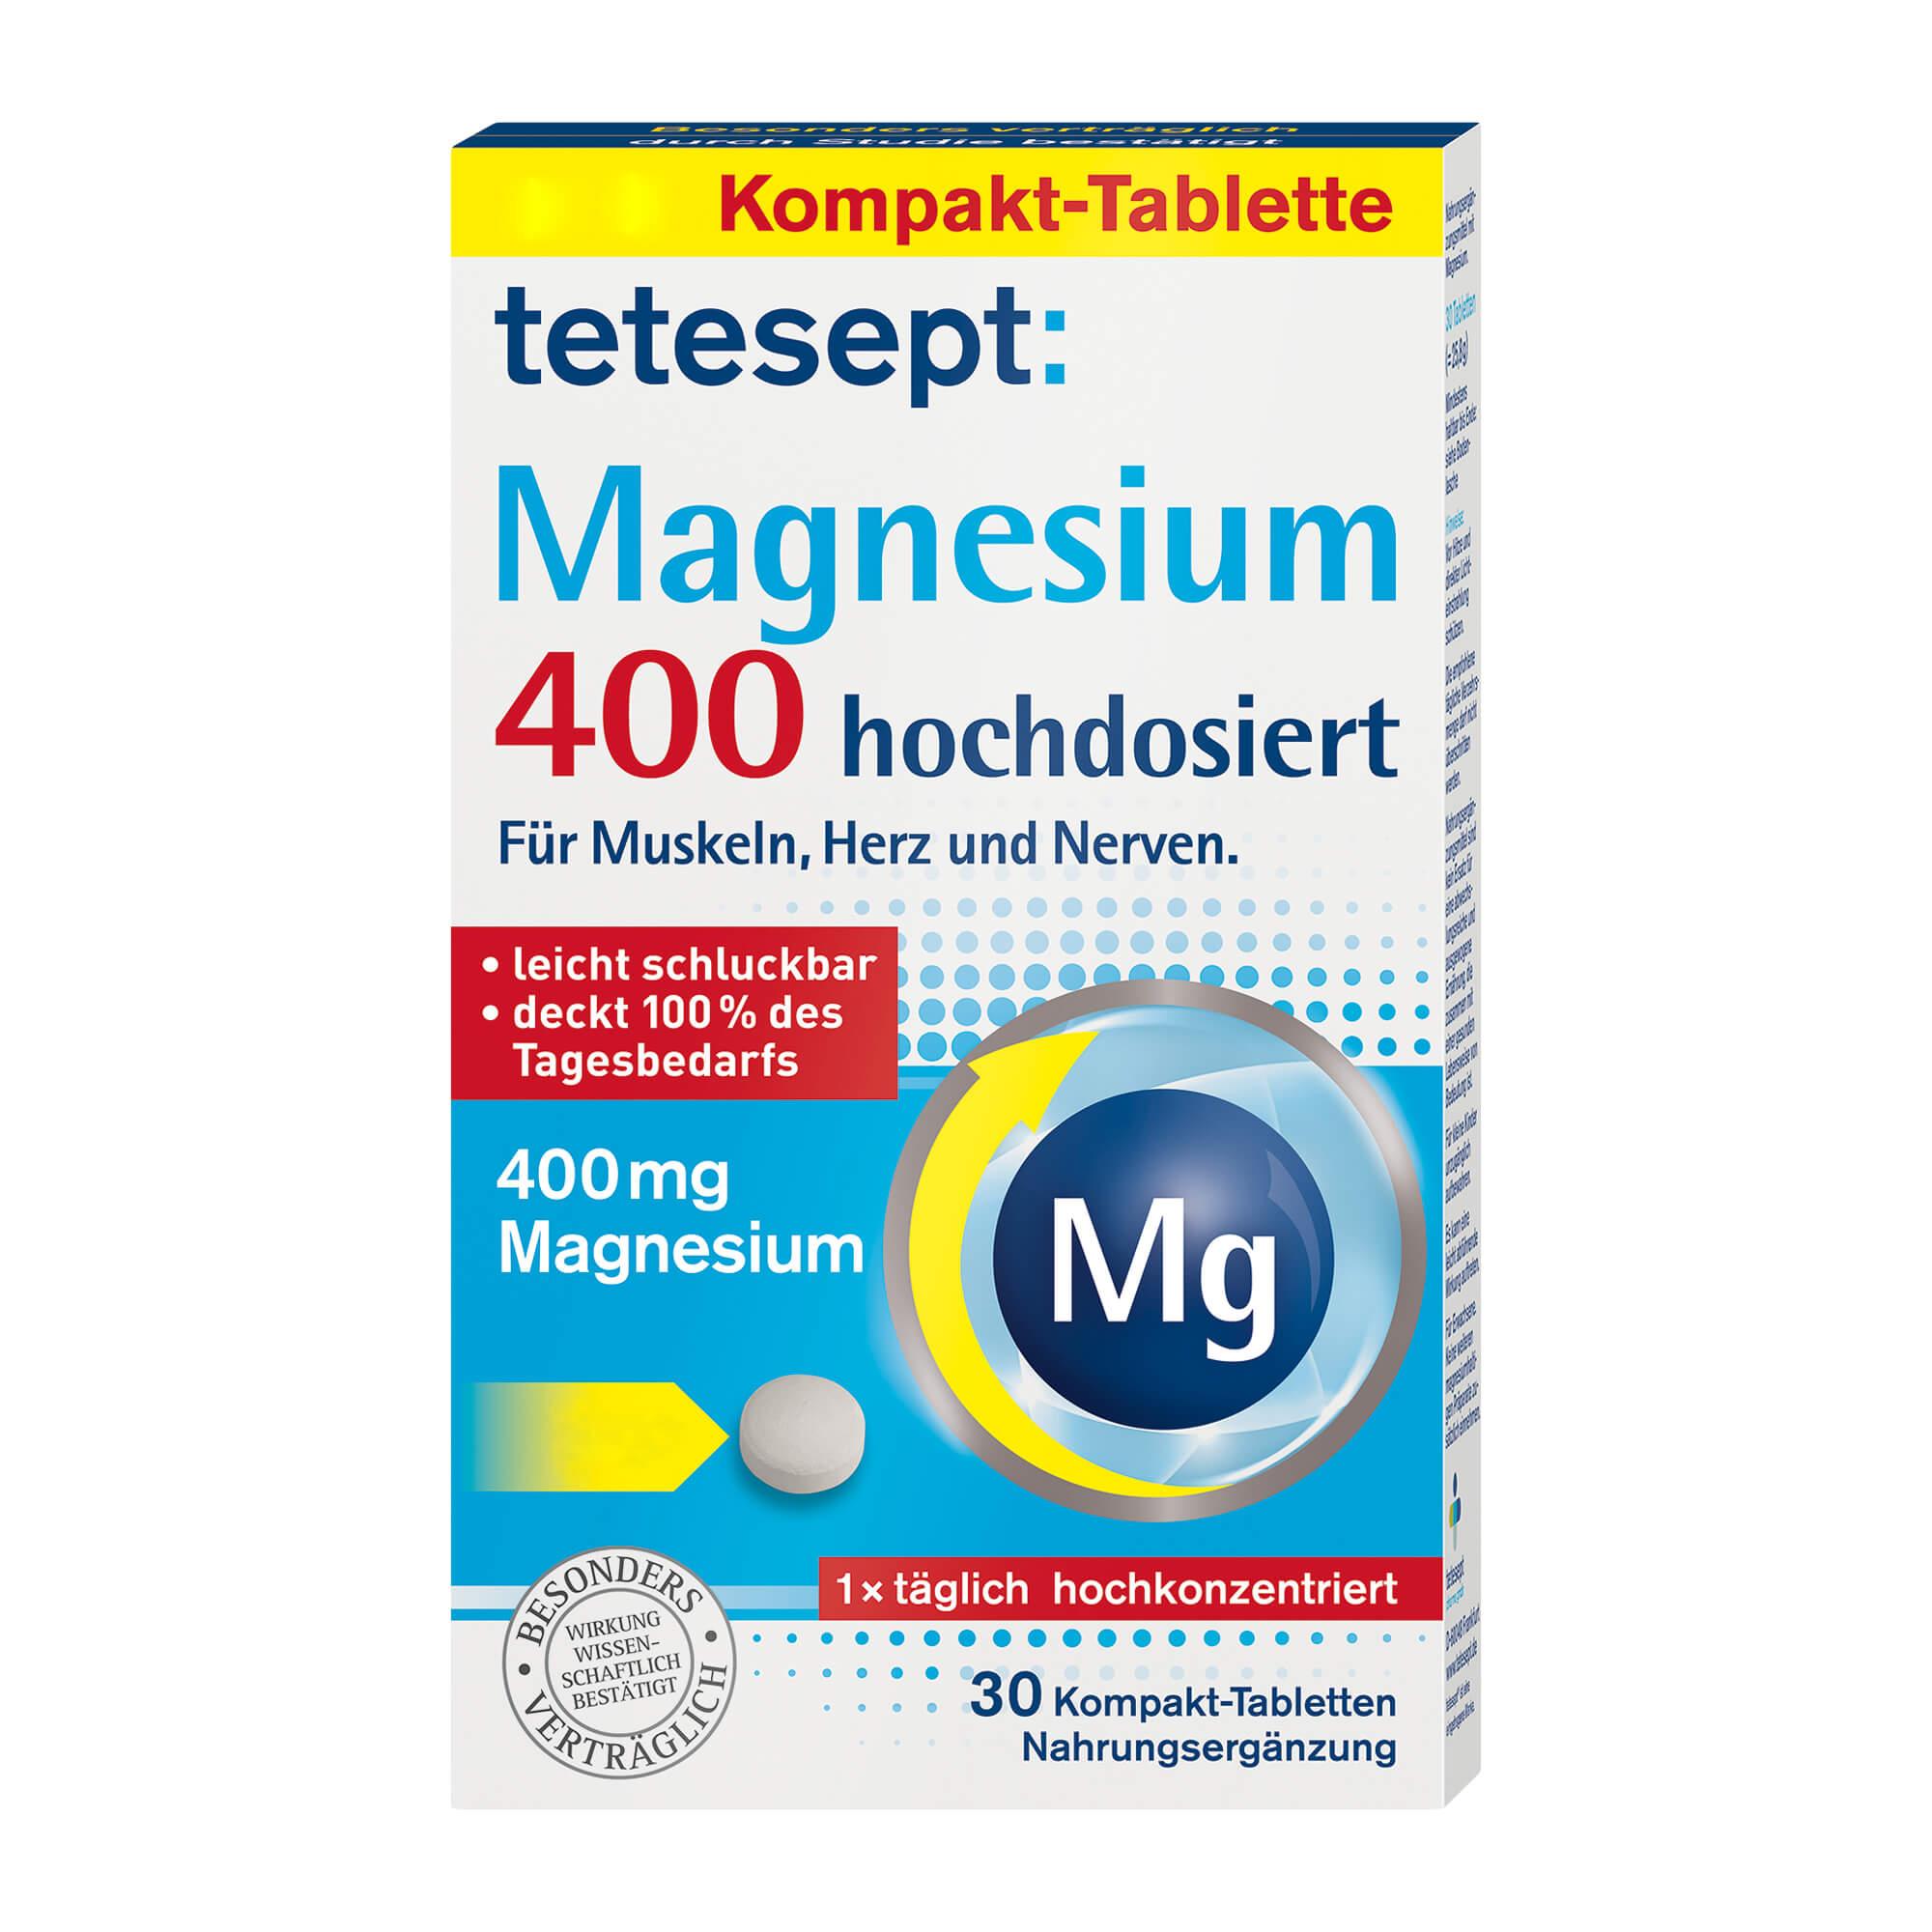 Tetesept Magnesium 400 hochdosiert